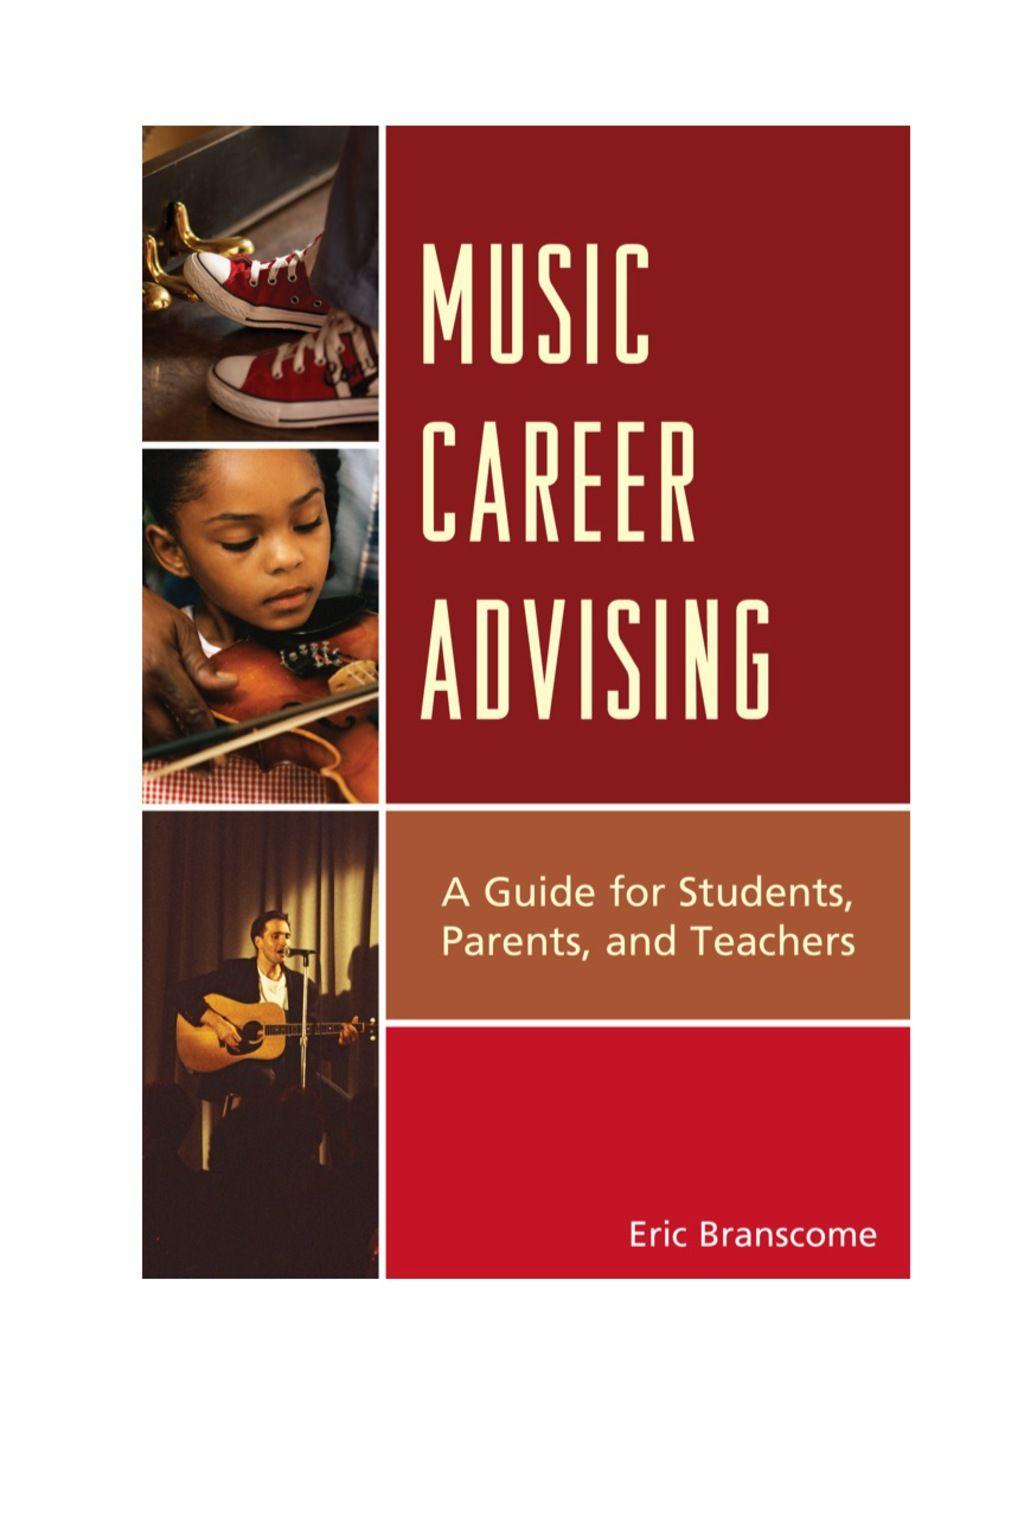 Music Career Advising (eBook Rental) Career, Career